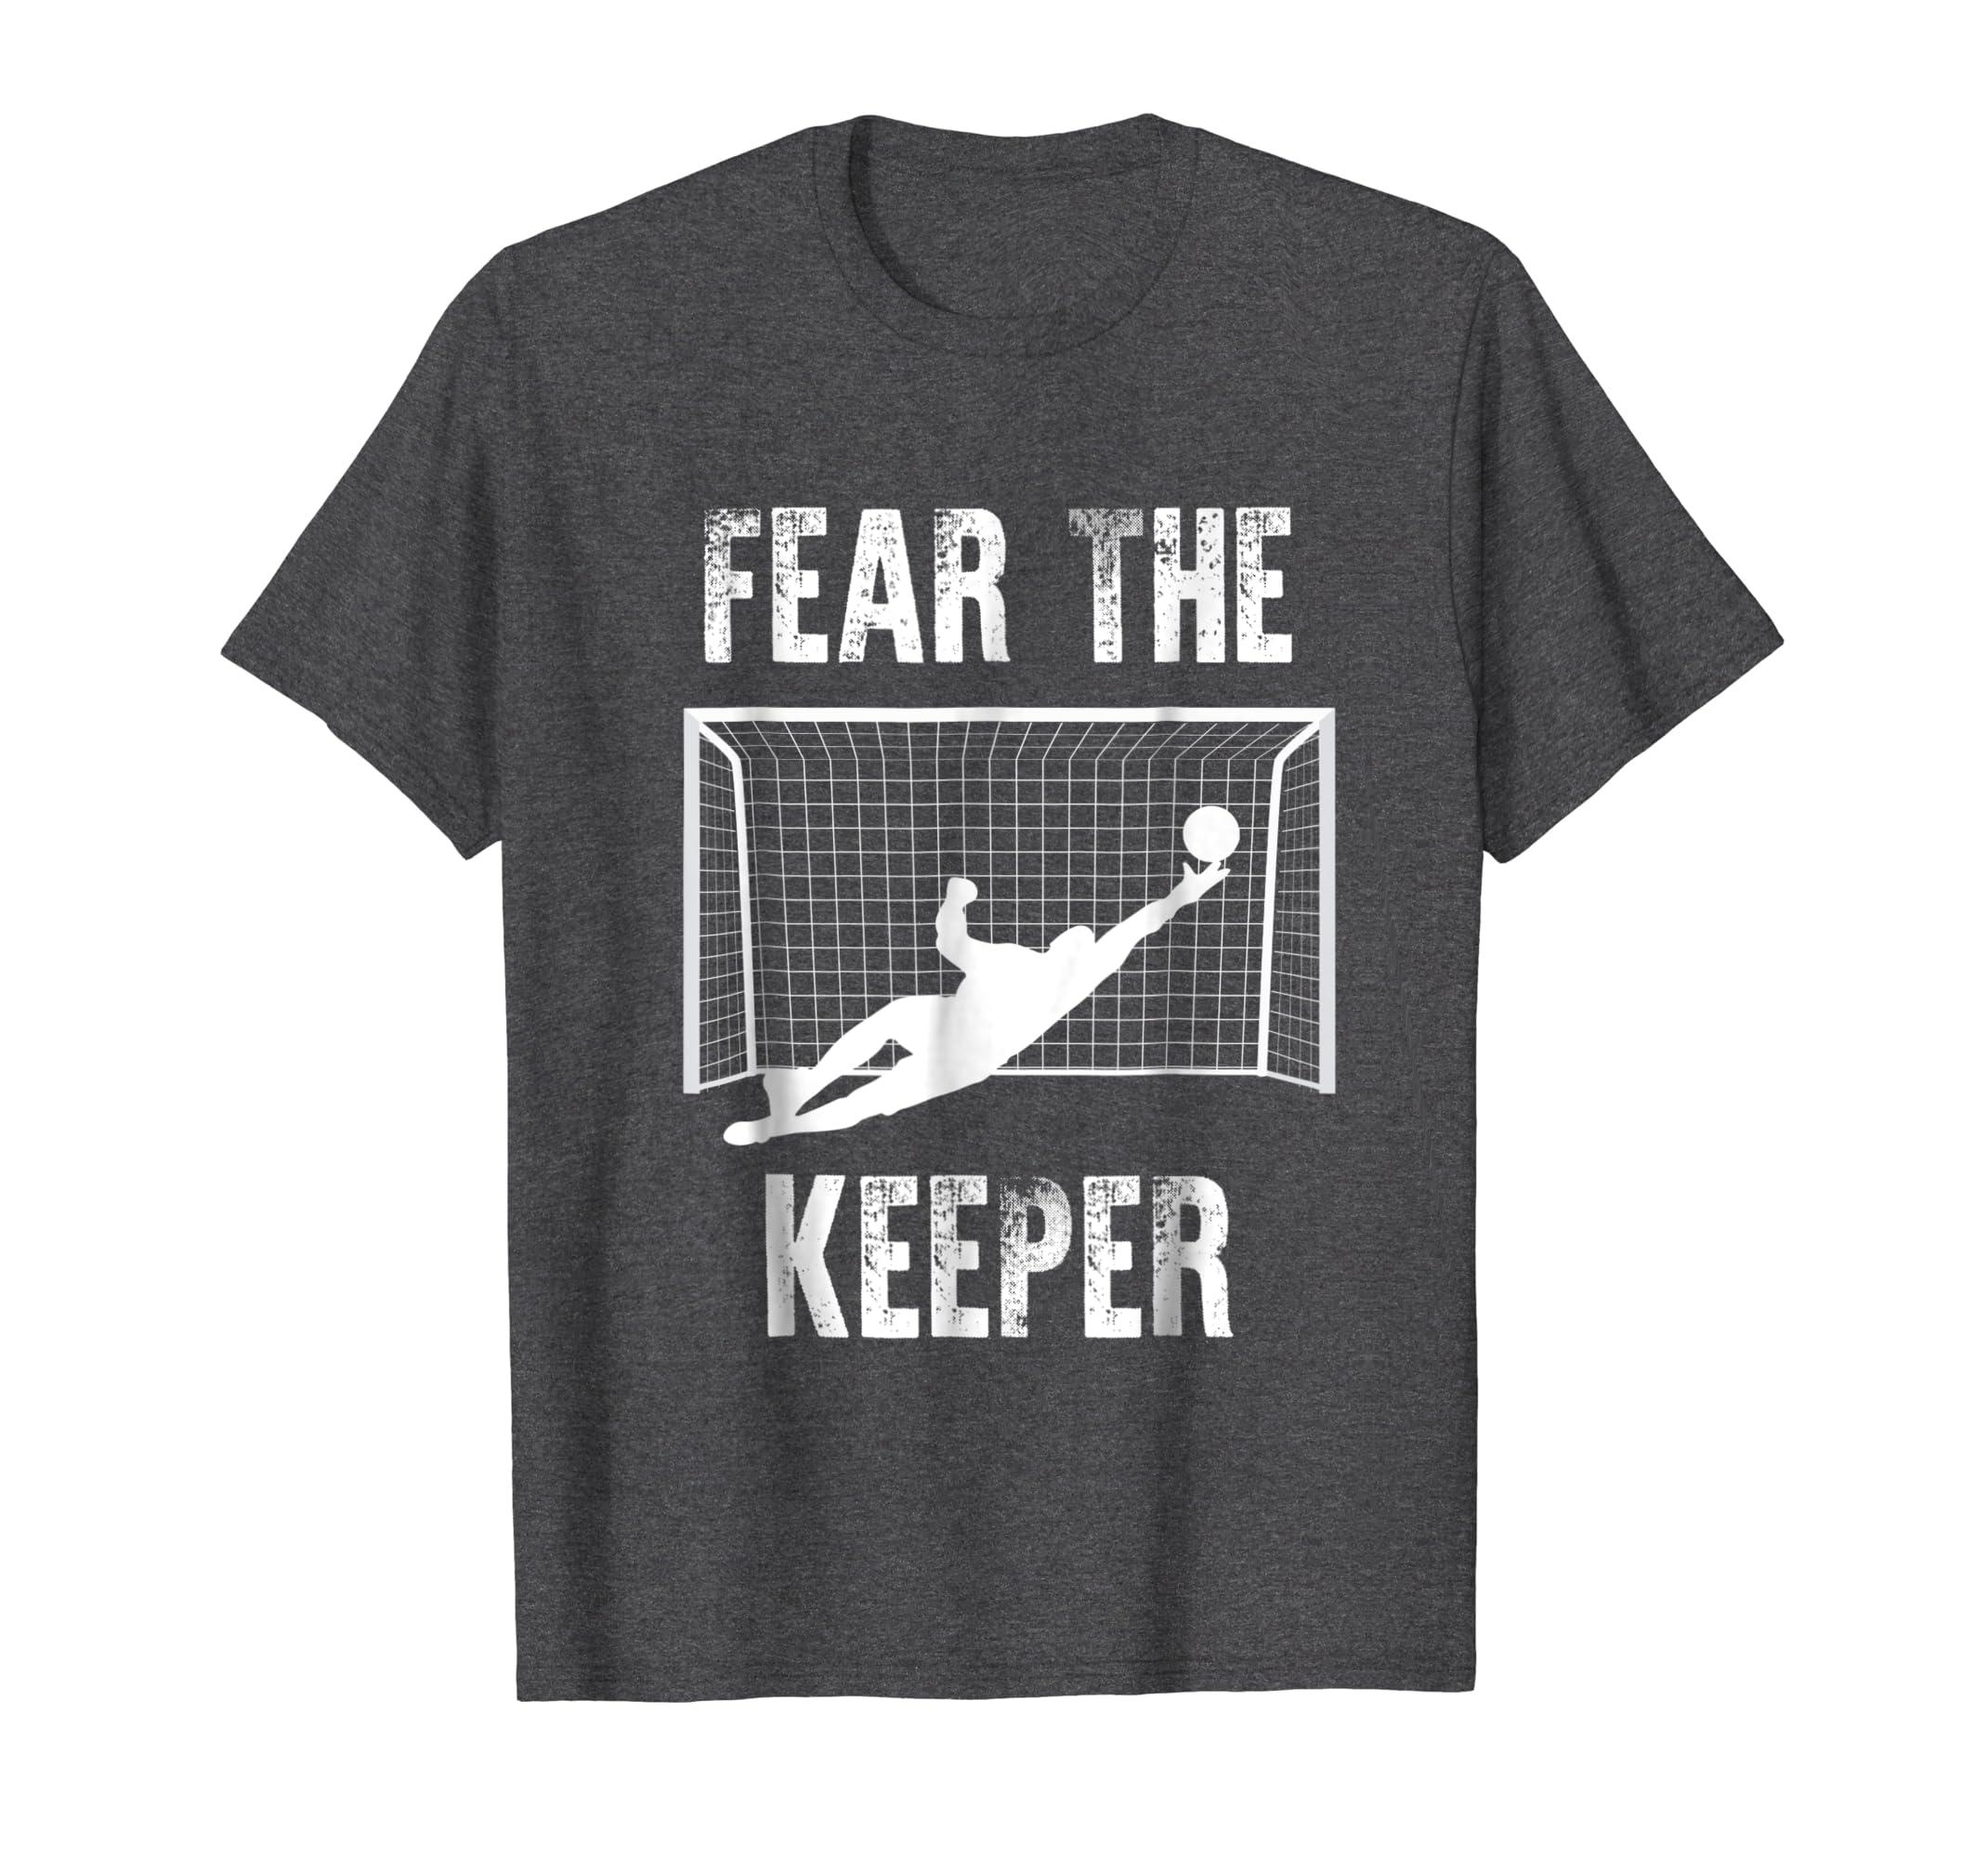 8acc8c1ca2b Amazon.com: Funny Goalkeeper Gift Shirts: Fear The Keeper Soccer T Shirt:  Clothing